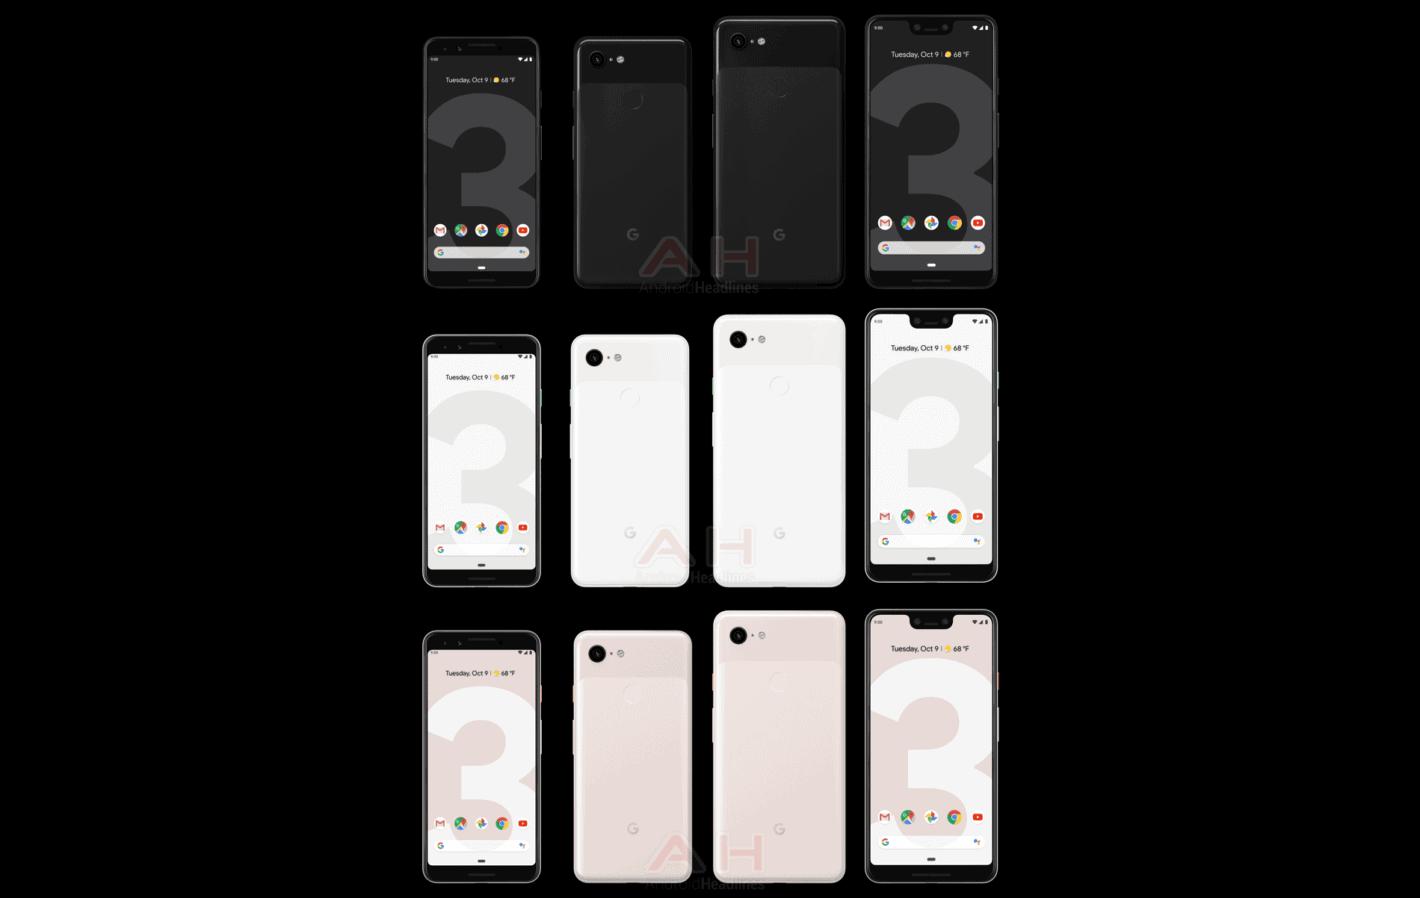 Google Pixel 3 and Google Pixel 3 XL Androidheadlines 2018